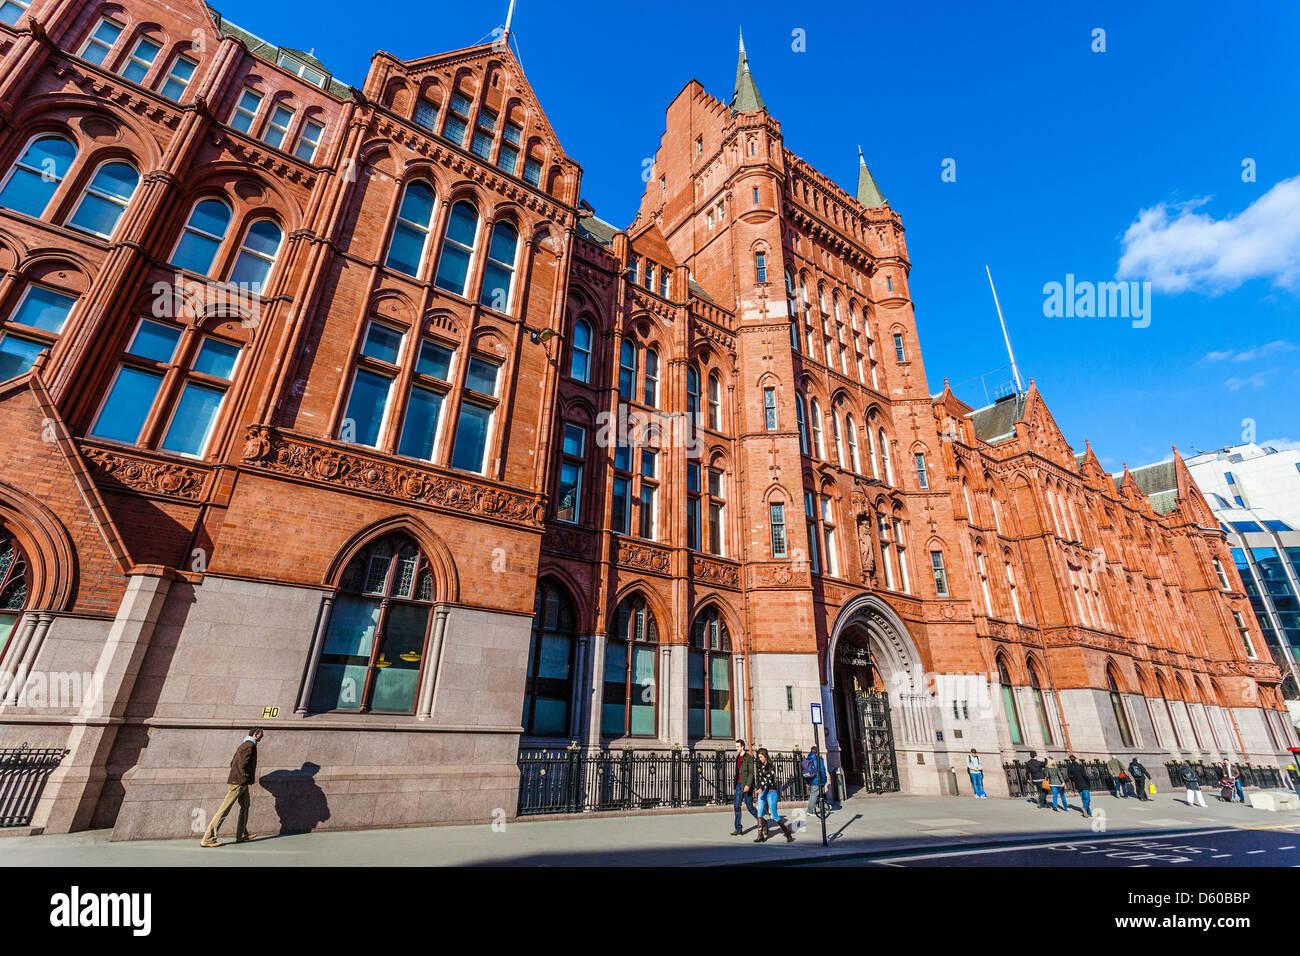 Prudential Assurance Building, aka Holborn Bars, Holborn, London, England, UK - Stock Image